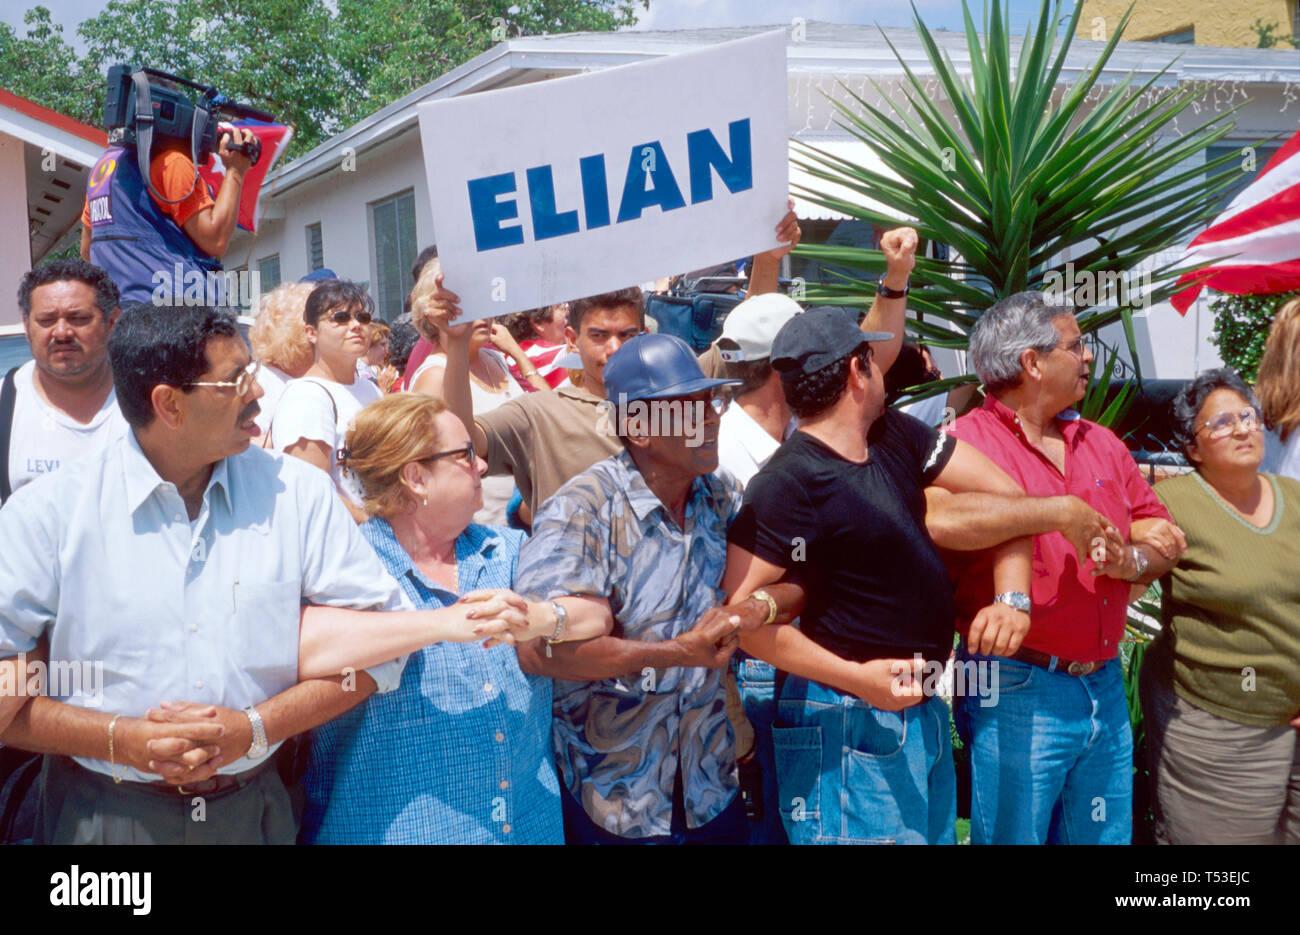 Miami Florida Little Havana Cuban refuges form human chain around Elian Gonzalez home protesting Castro government Stock Photo